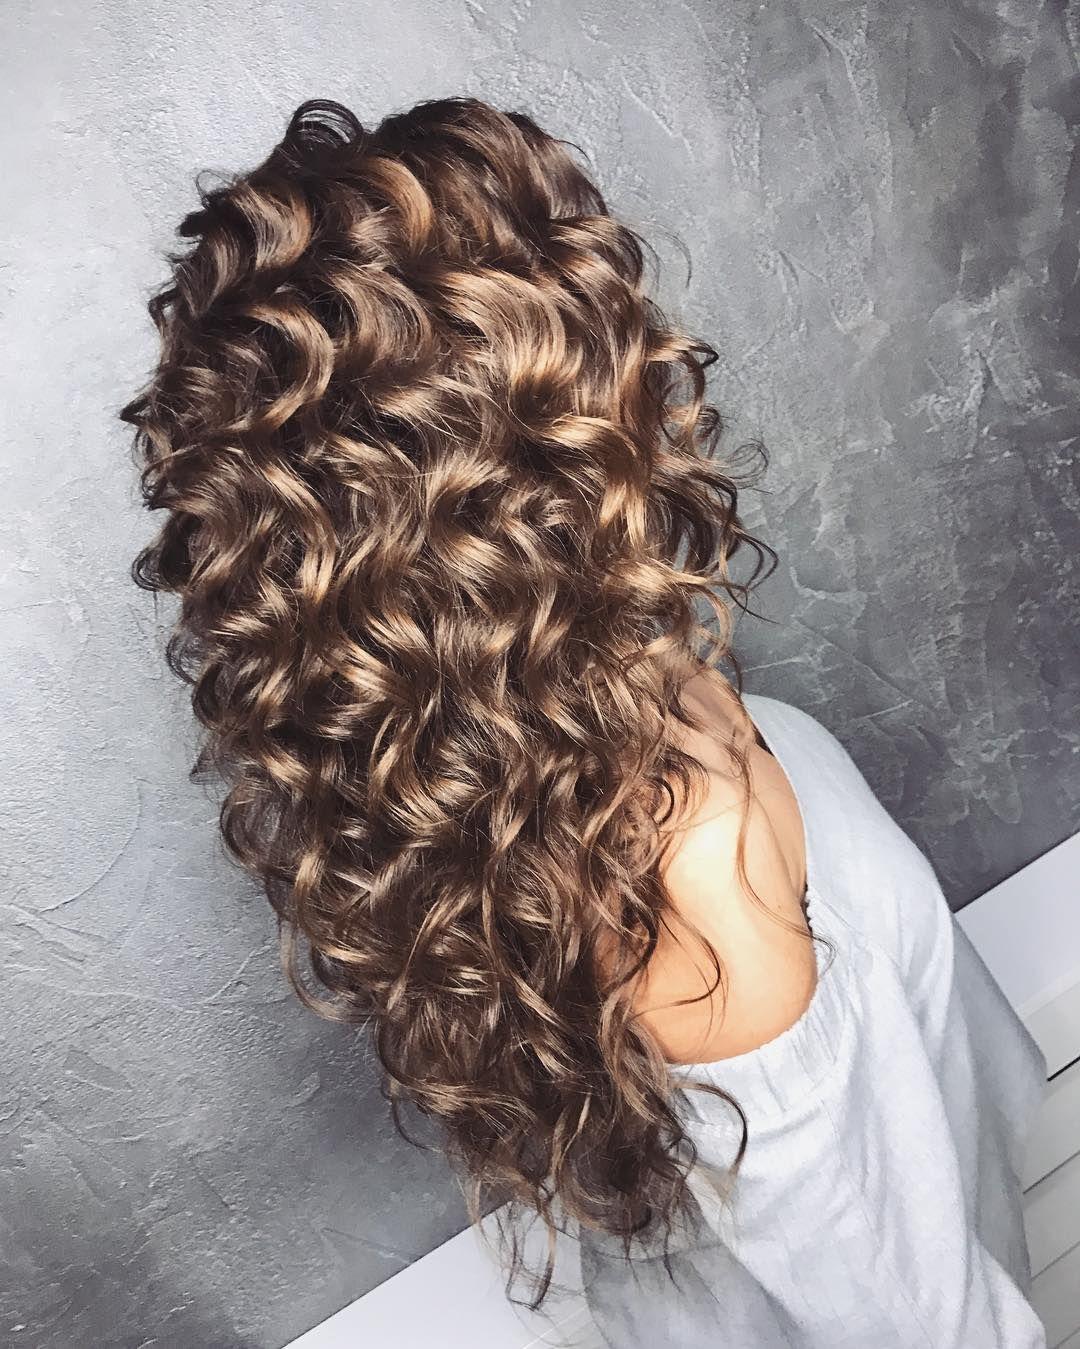 Pin by savannah on hairstyles pinterest hair style hair